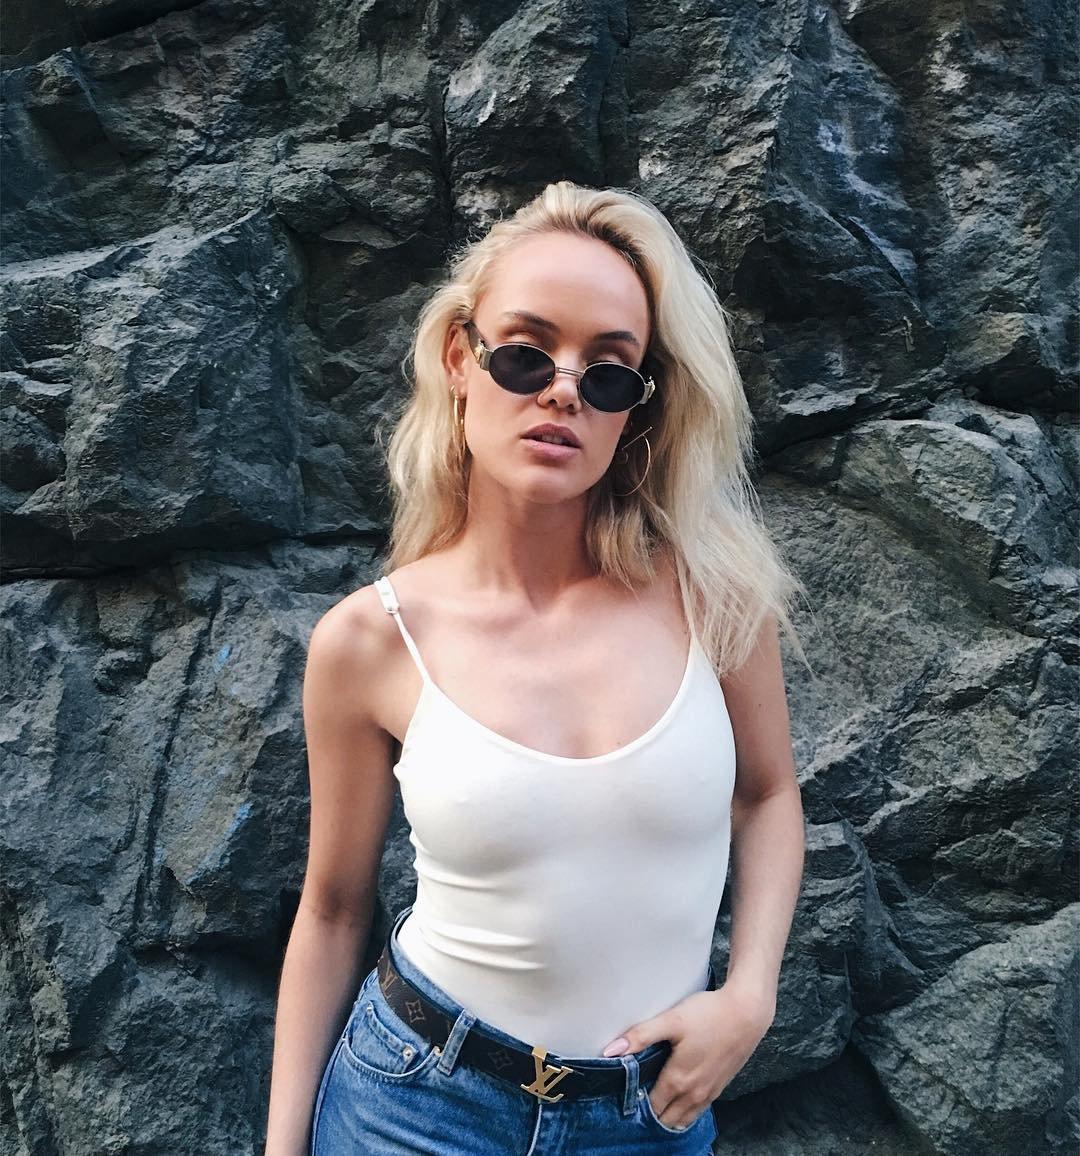 Amanda winberg tits